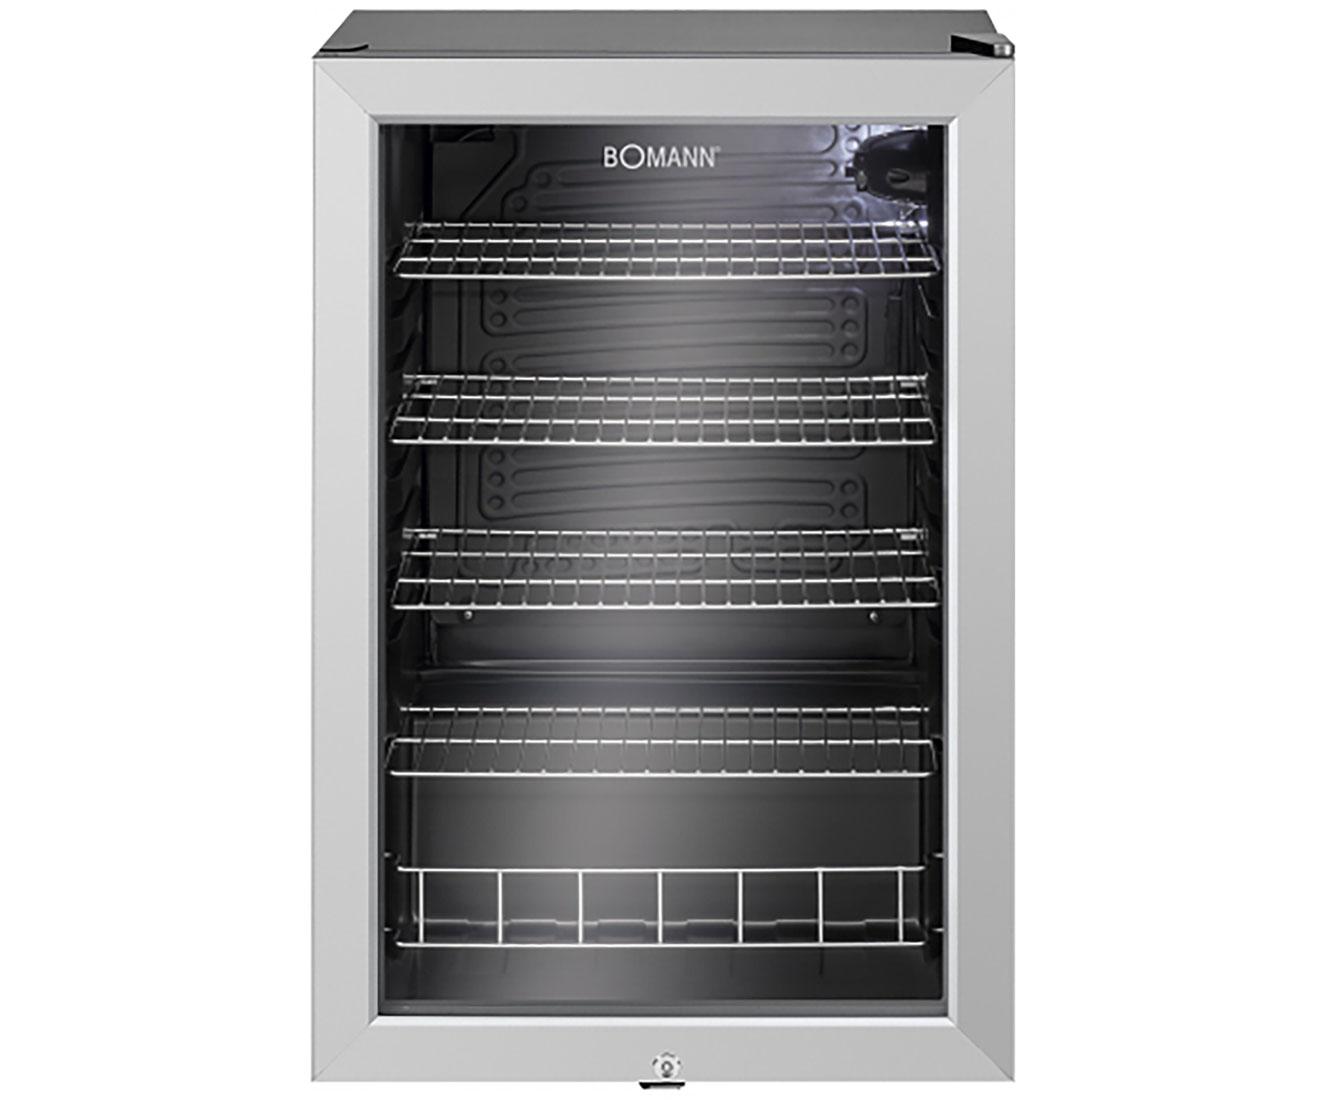 Bomann Kühlschrank Freistehend : Bomann ksg 238.1 kühlschrank freistehend 54cm schwarz neu ebay